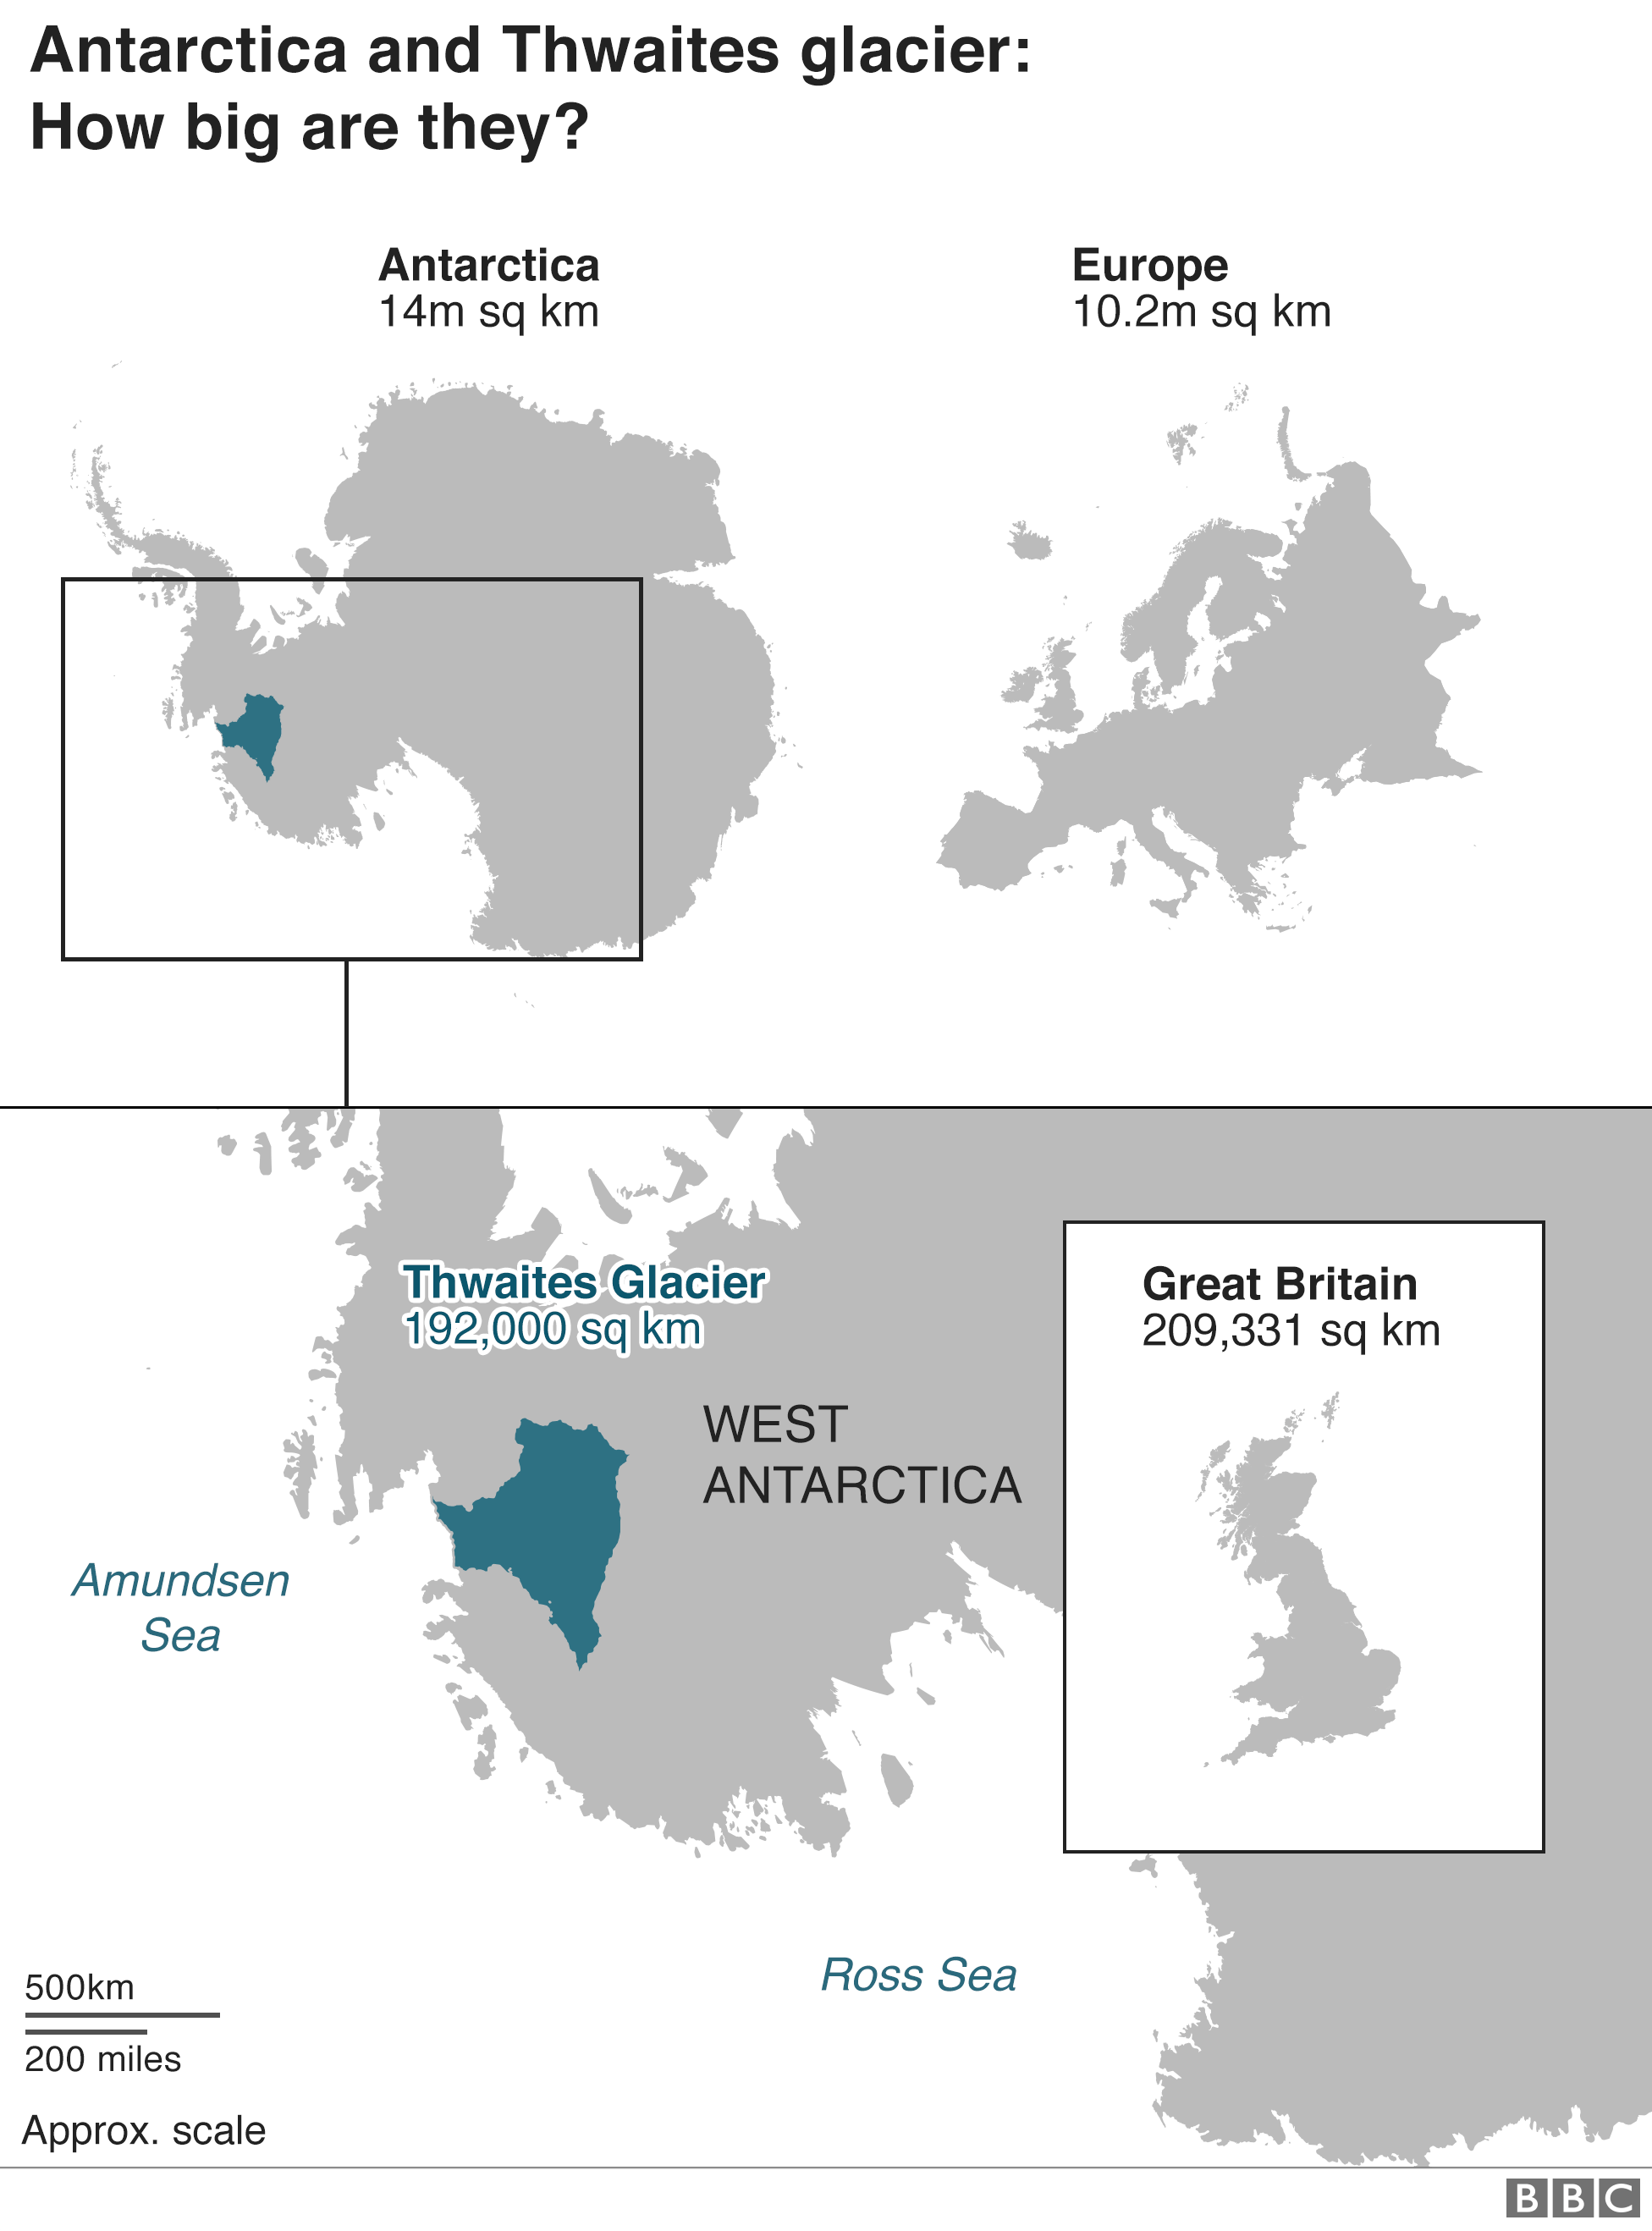 Size comparison of Antarctica and Thwaites glacier